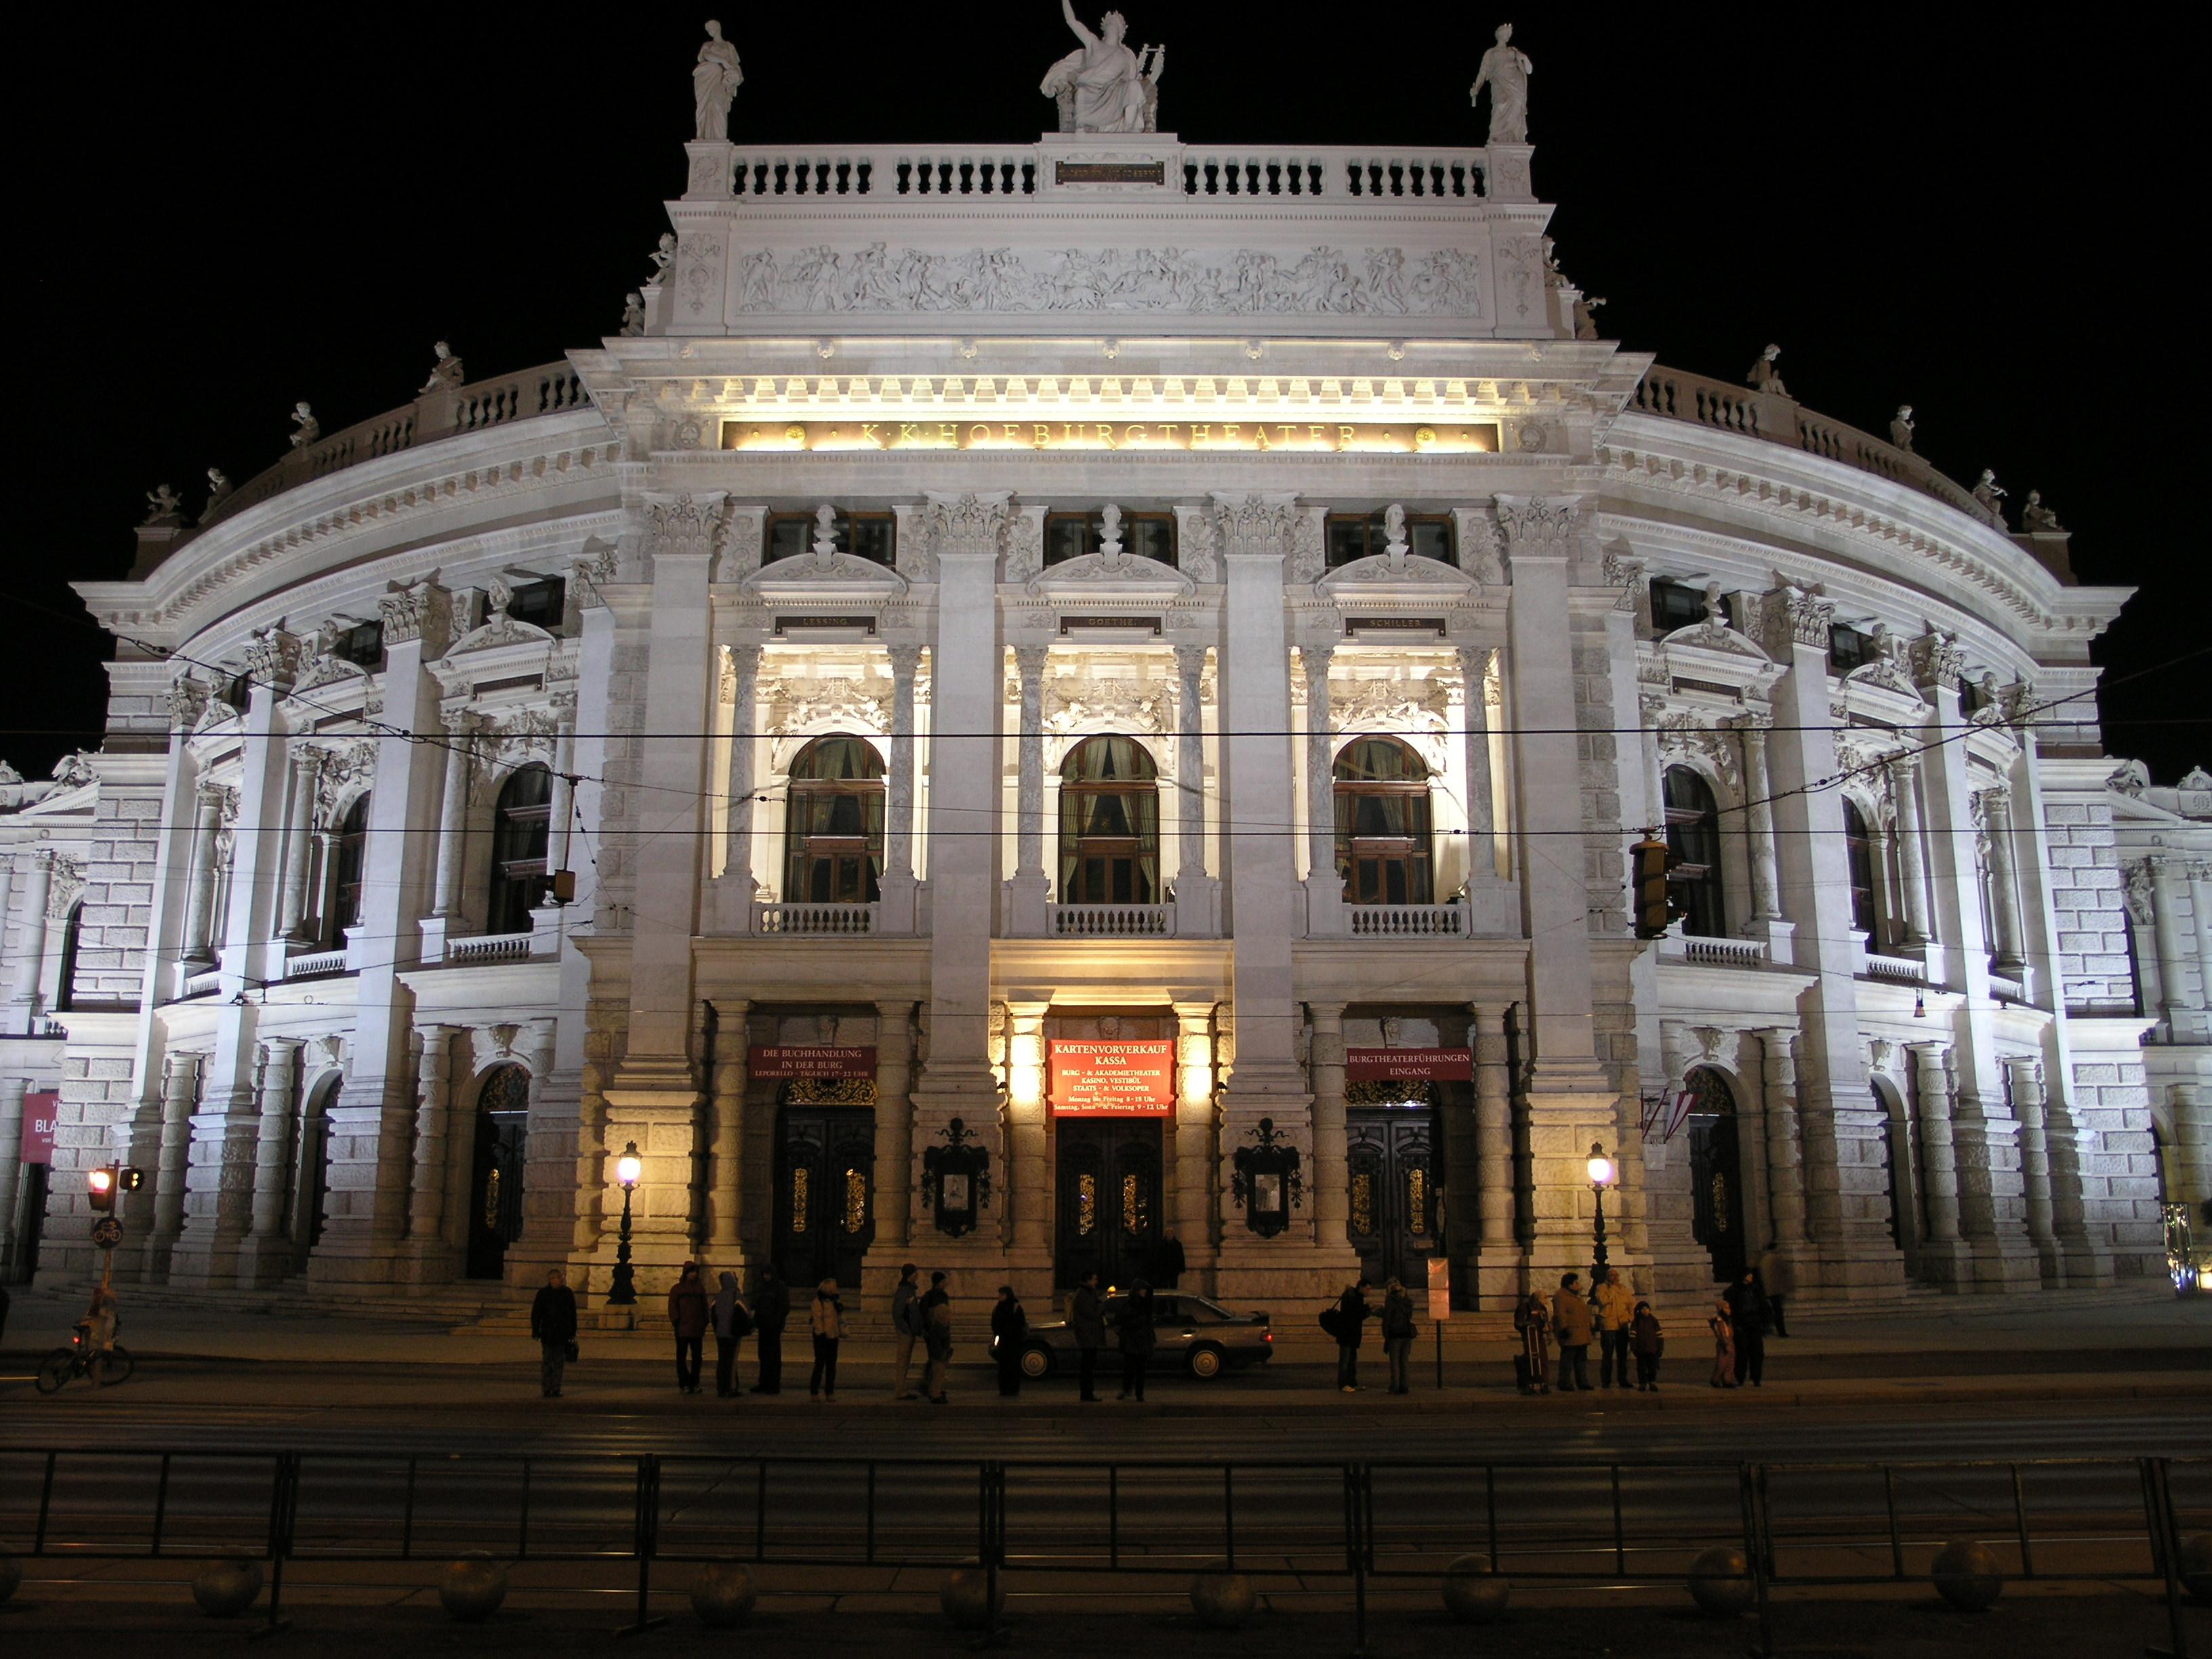 Das Wiener Hofburgtheater